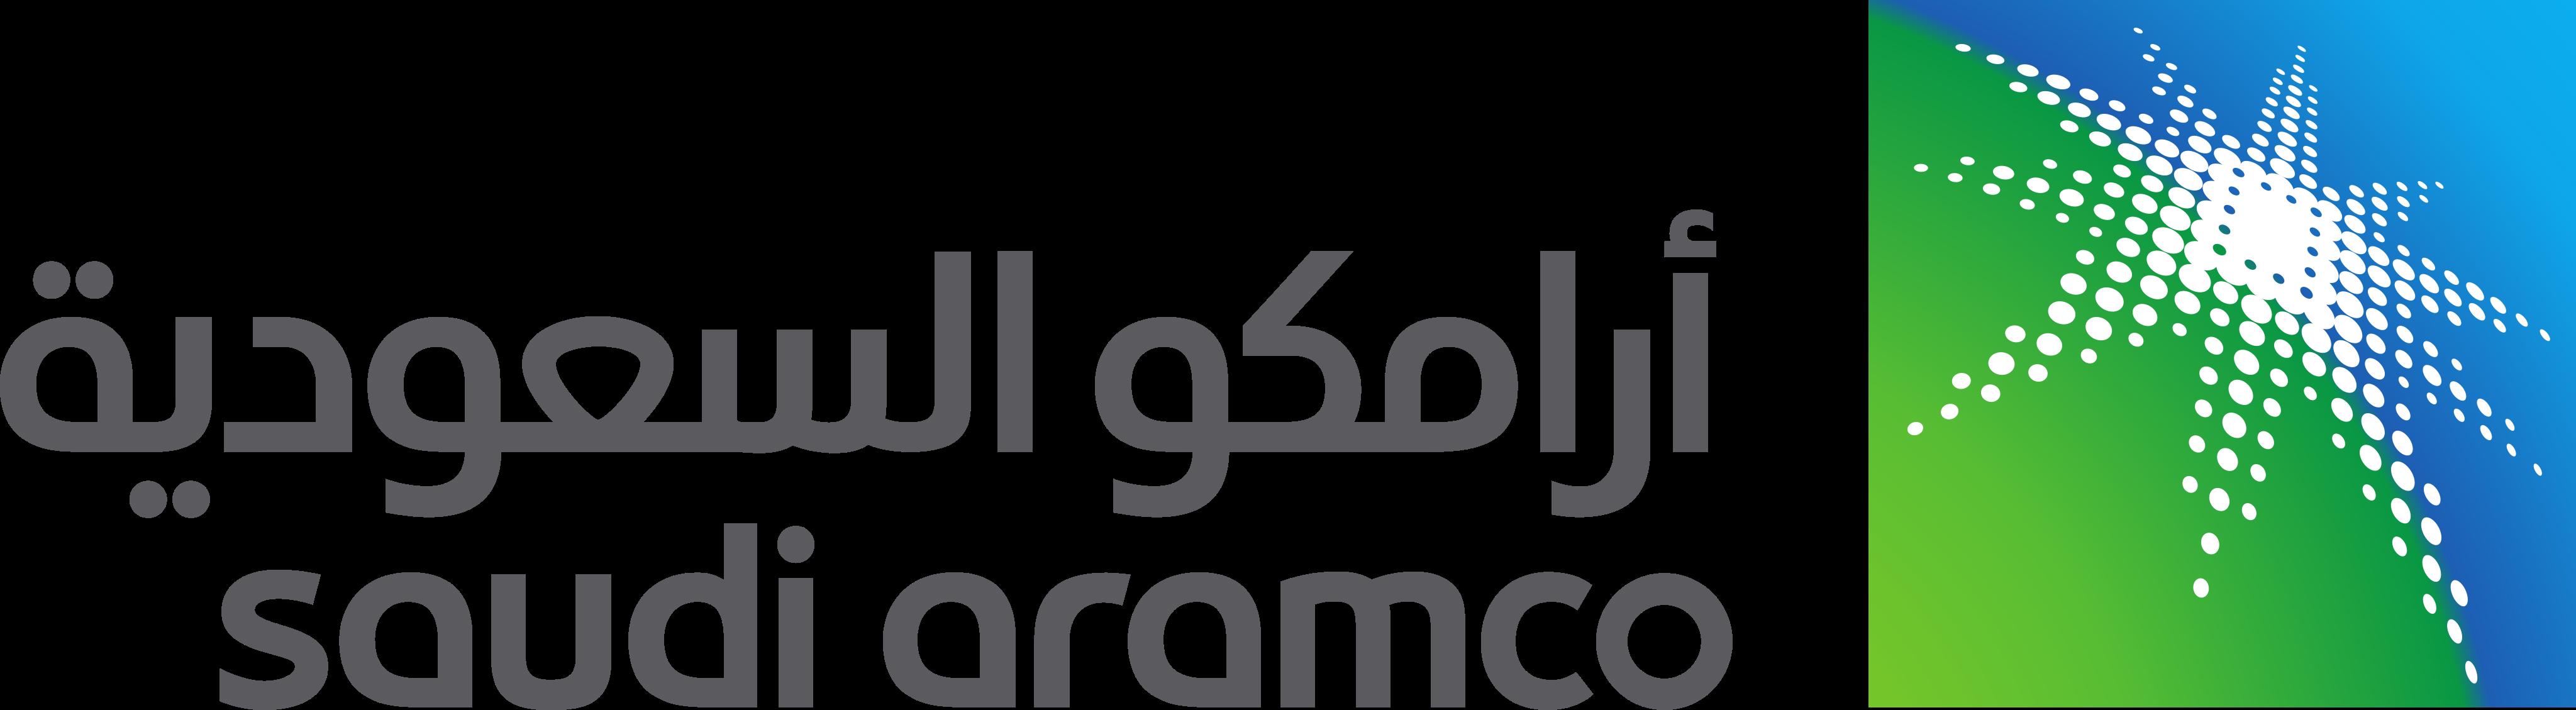 saudi-aramco-logo